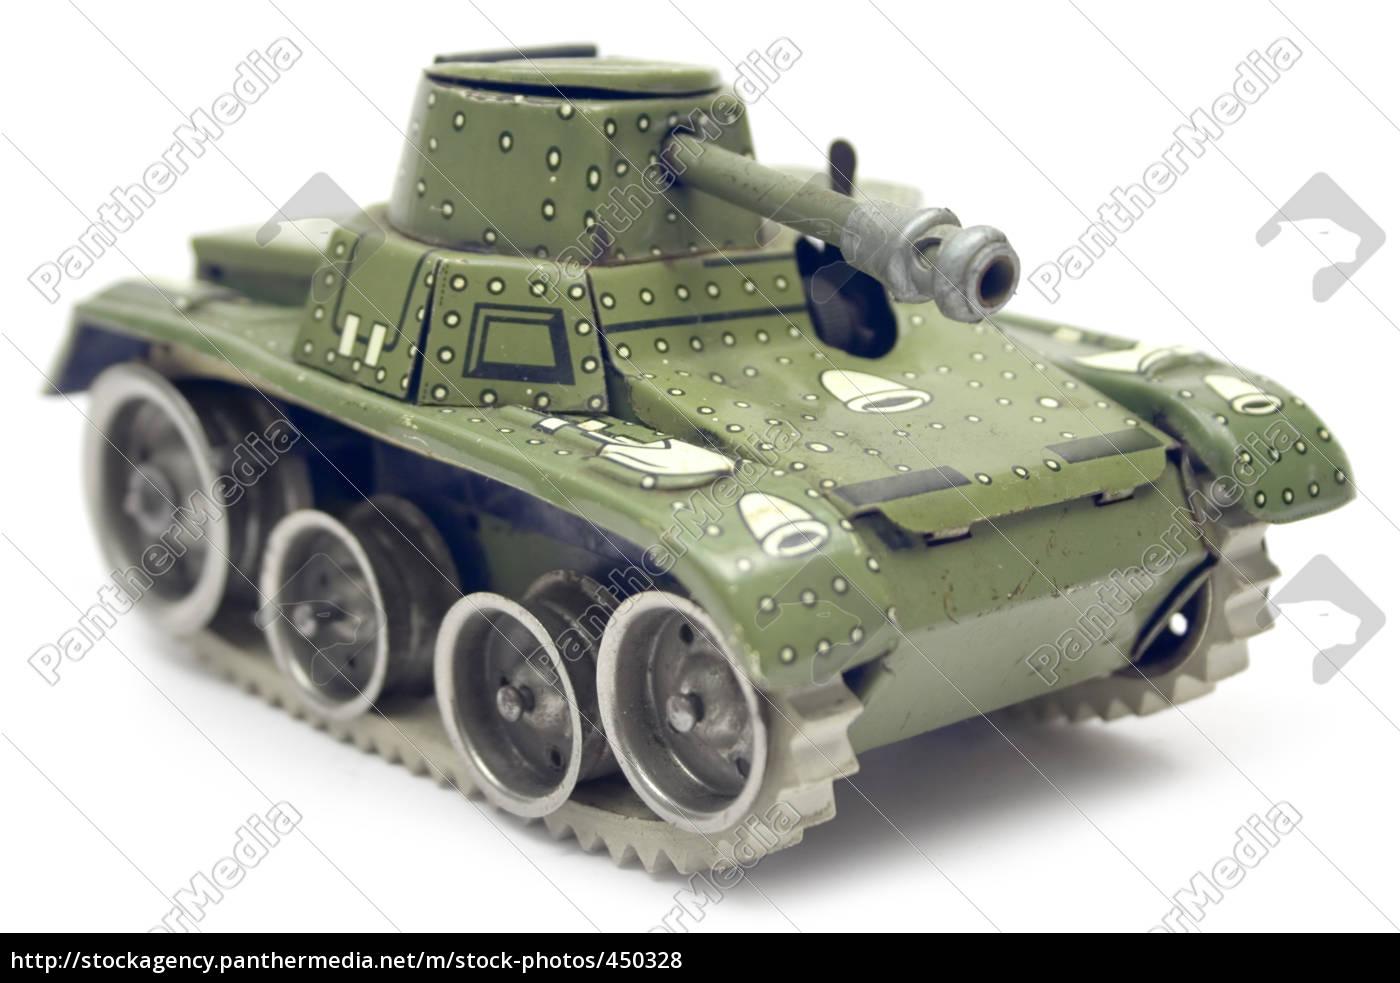 old, toy, tanks - 450328